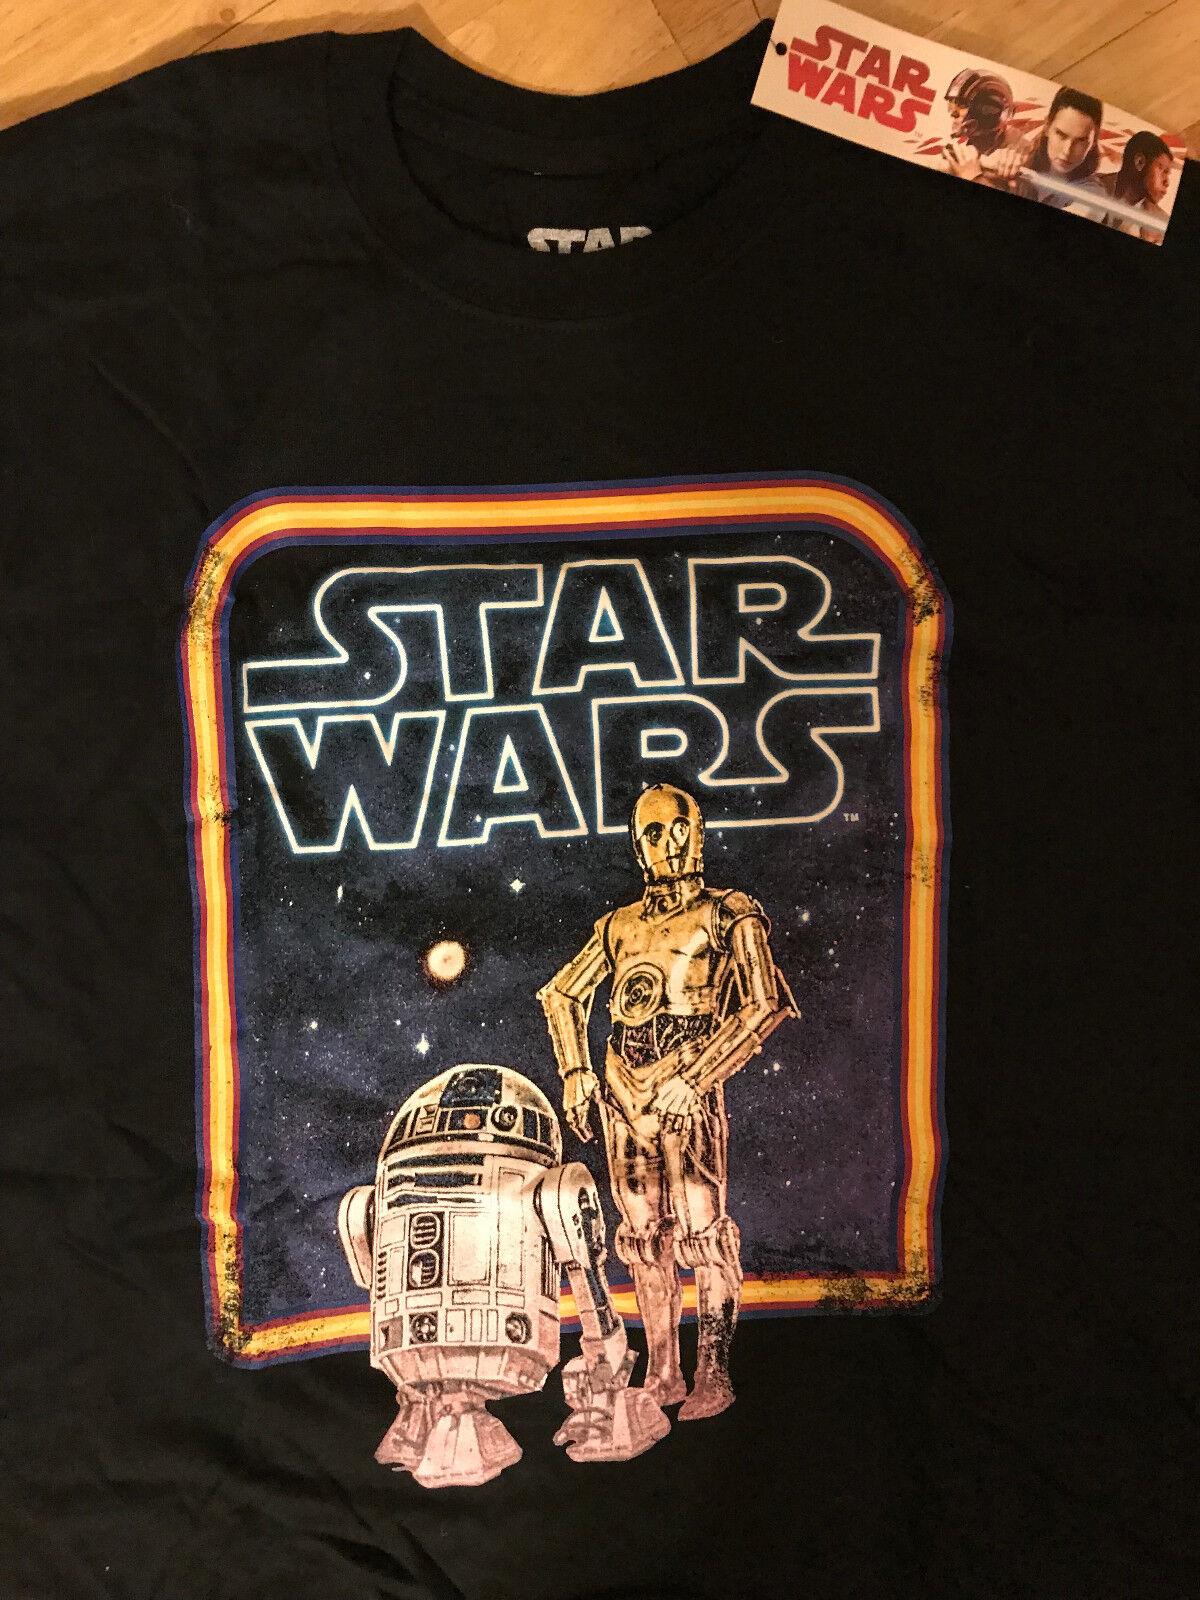 BNWT Star R2D2 Wars T-Shirt Retro R2D2 Star C3PO Taille Moyenne Disney Geek Nerd cf3a23